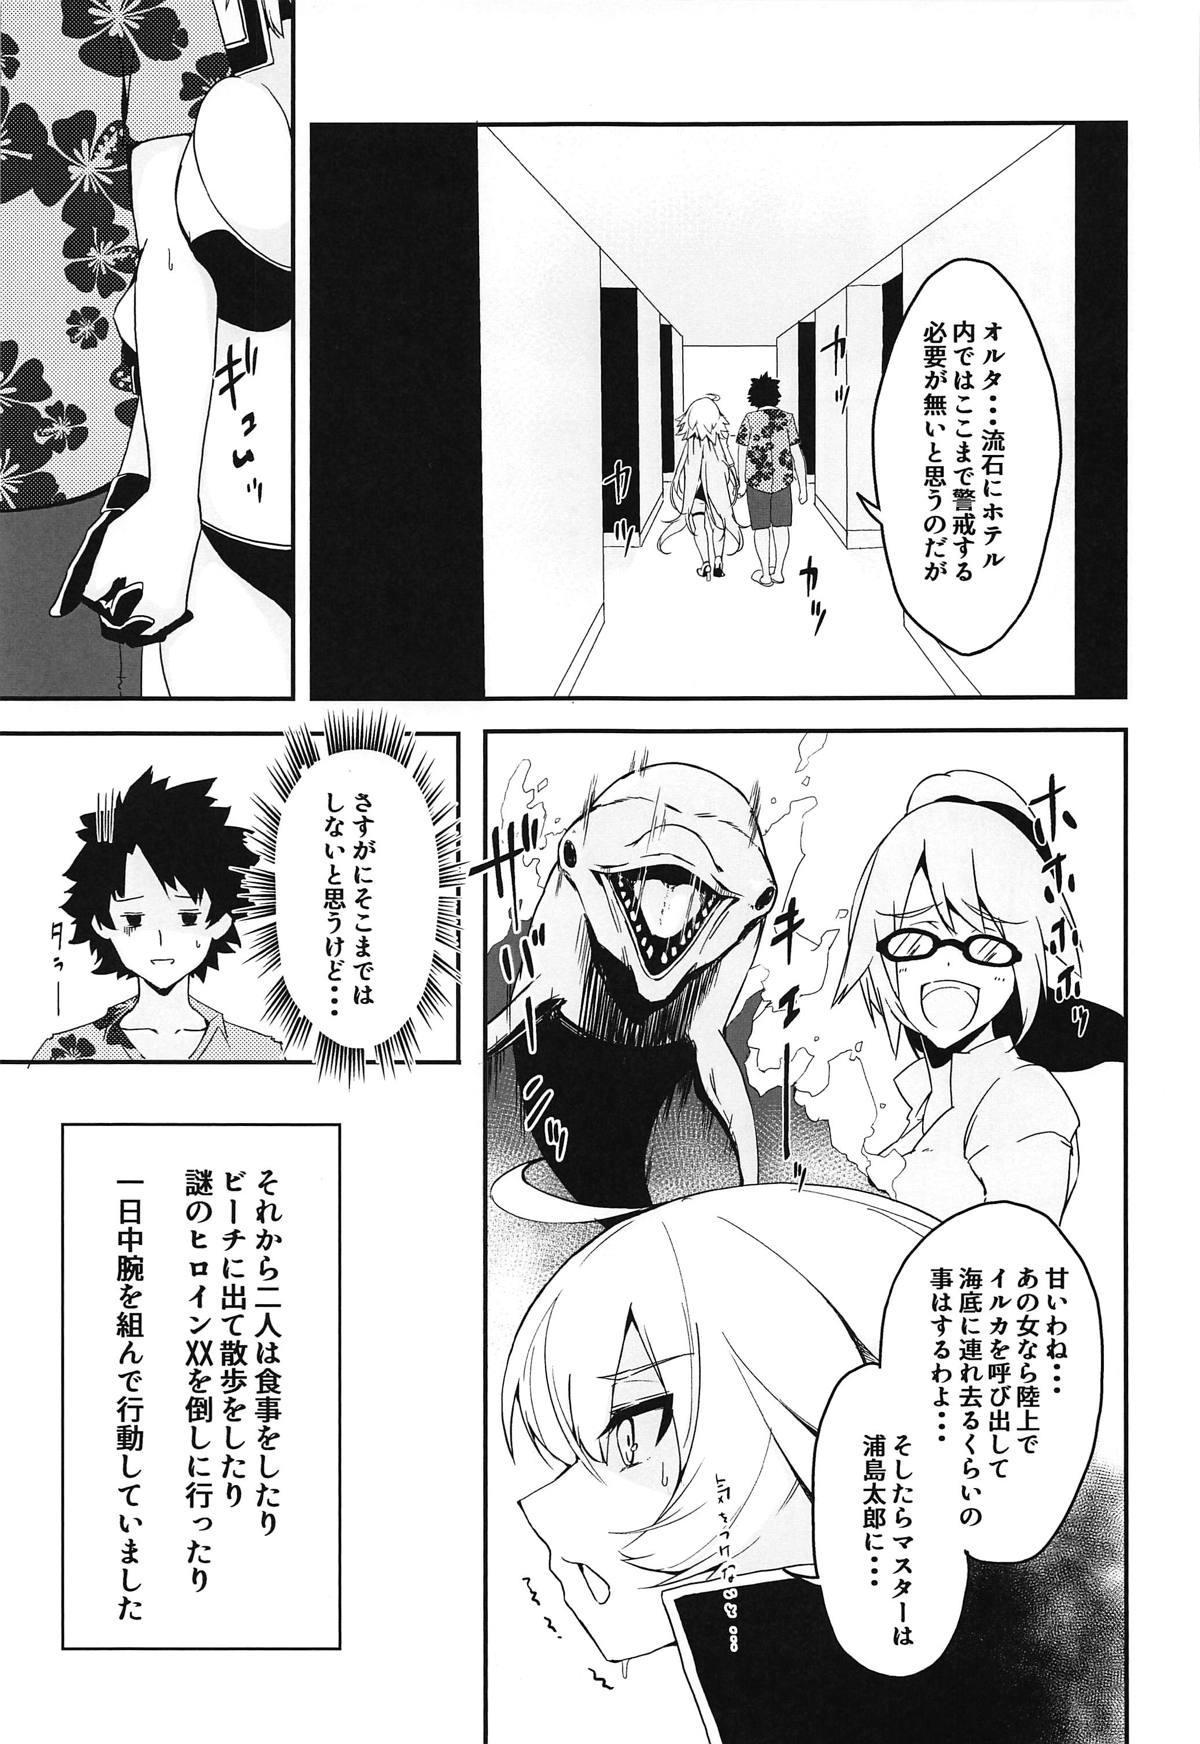 Double Jeanne to Shiawase 3P Luluhawa Seikatsu 11